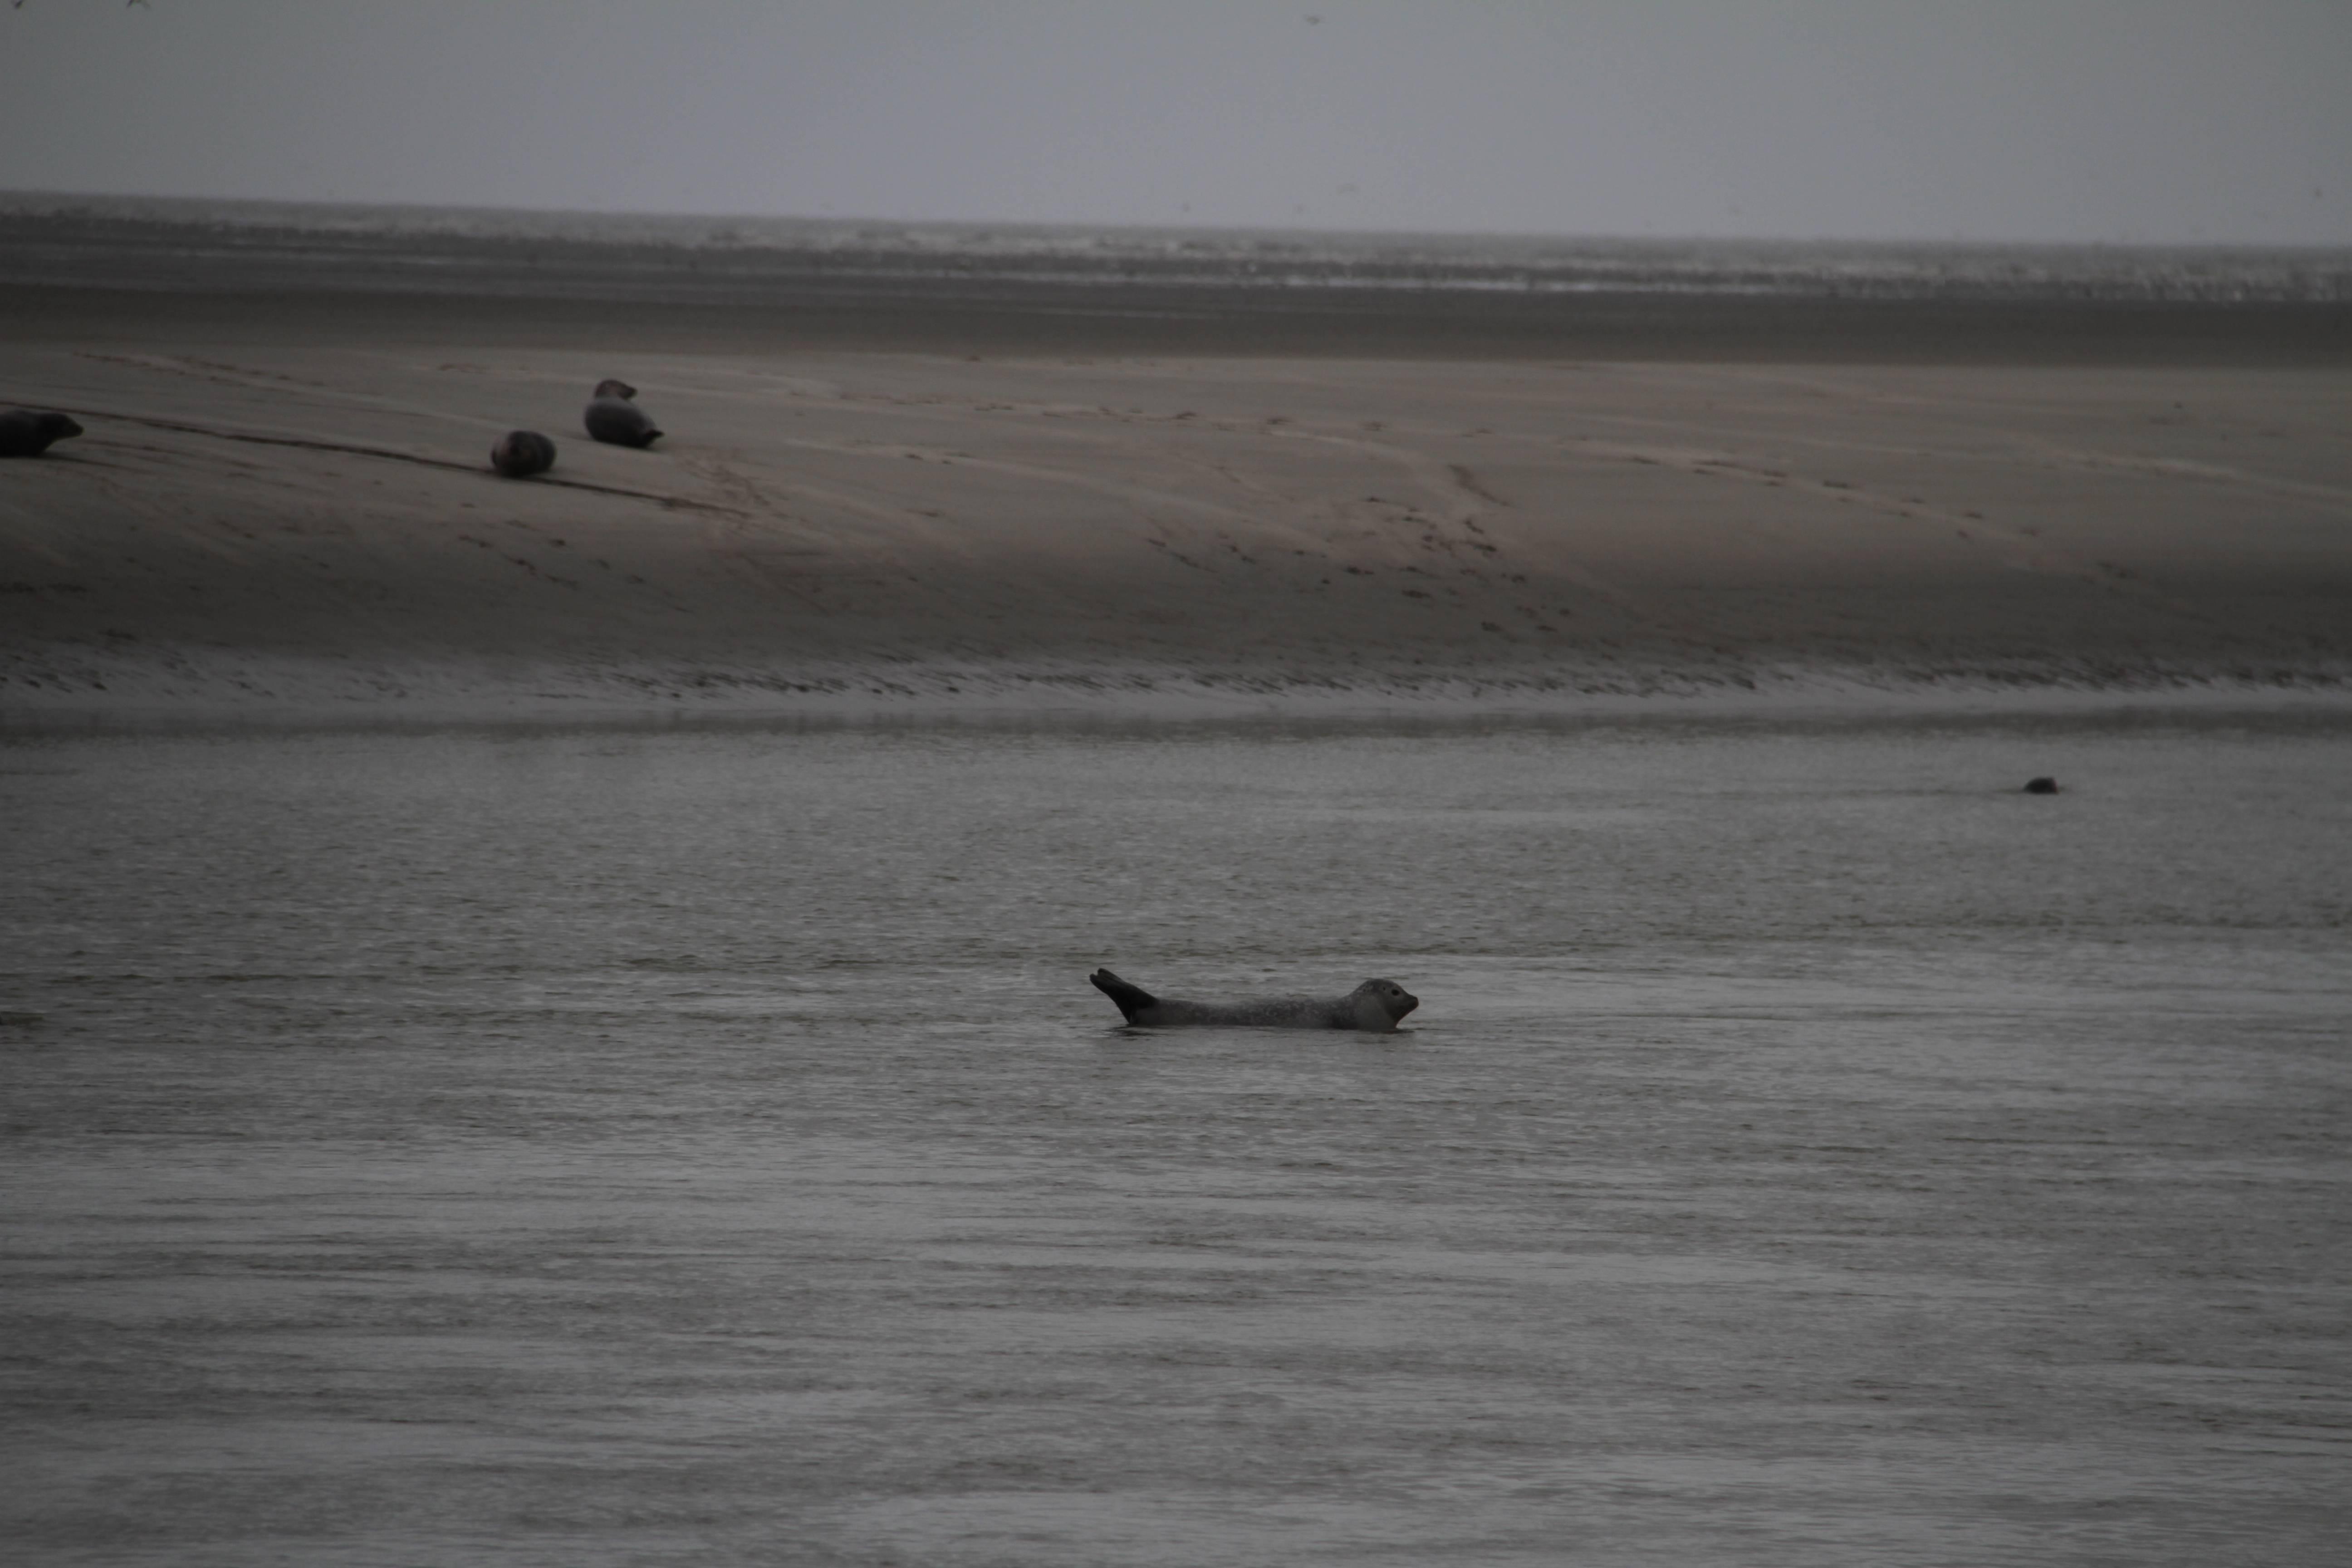 Baie de Somme mai 2015_0127 Berck sur mer